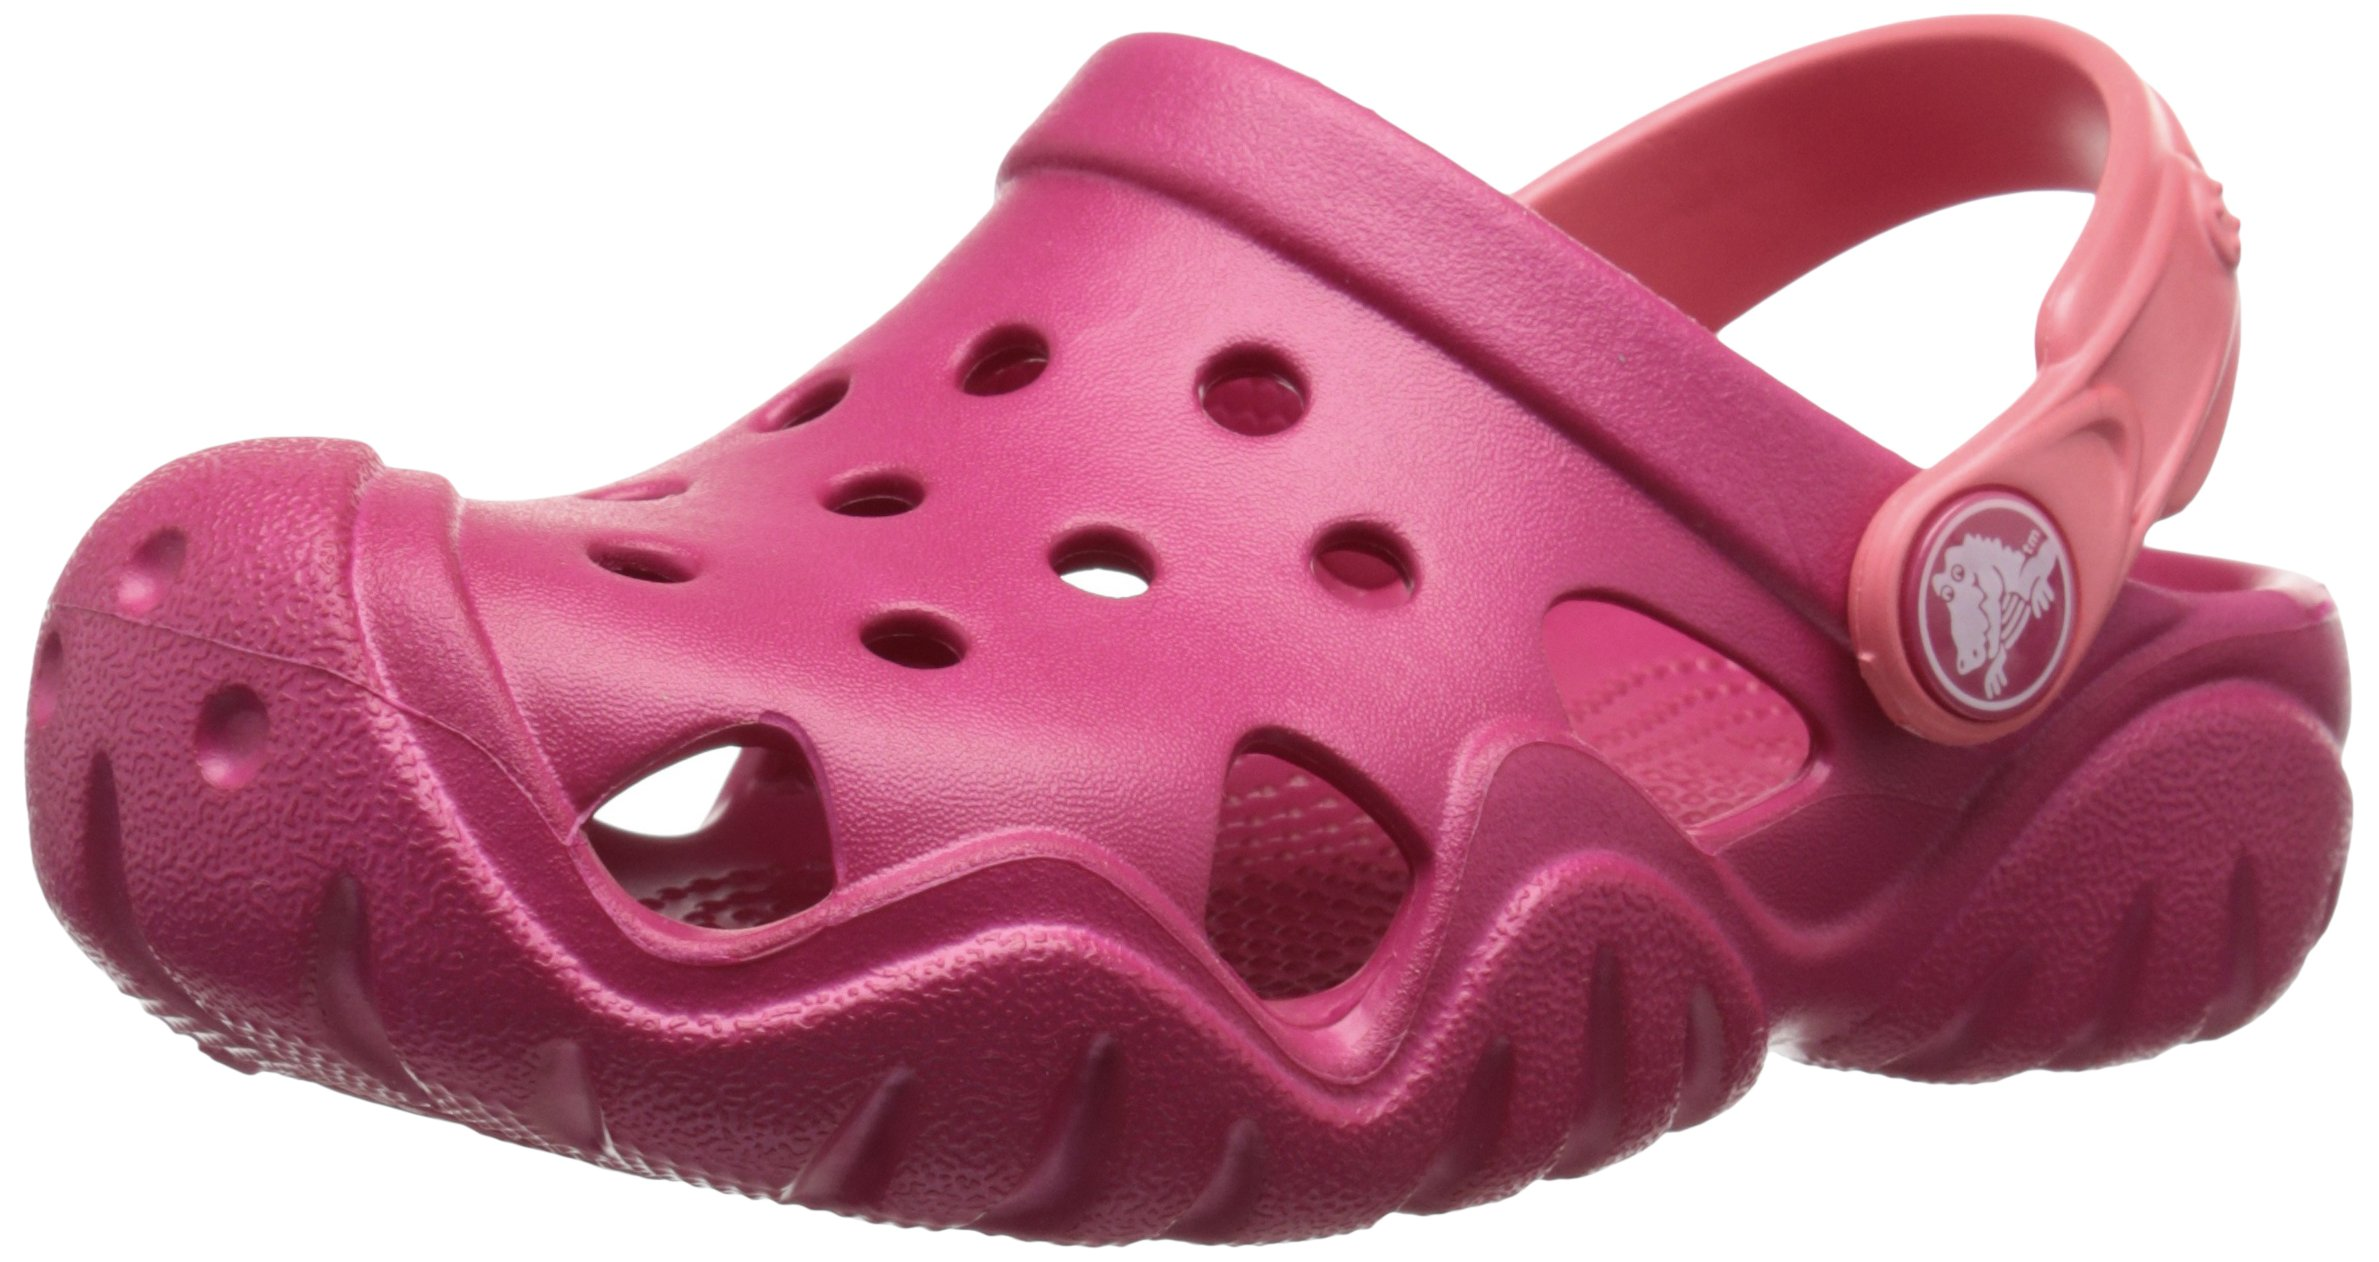 Crocs Kids' Swiftwater K Clog (Toddler/Little Kid), Raspberry/Coral, 10 M US Toddler